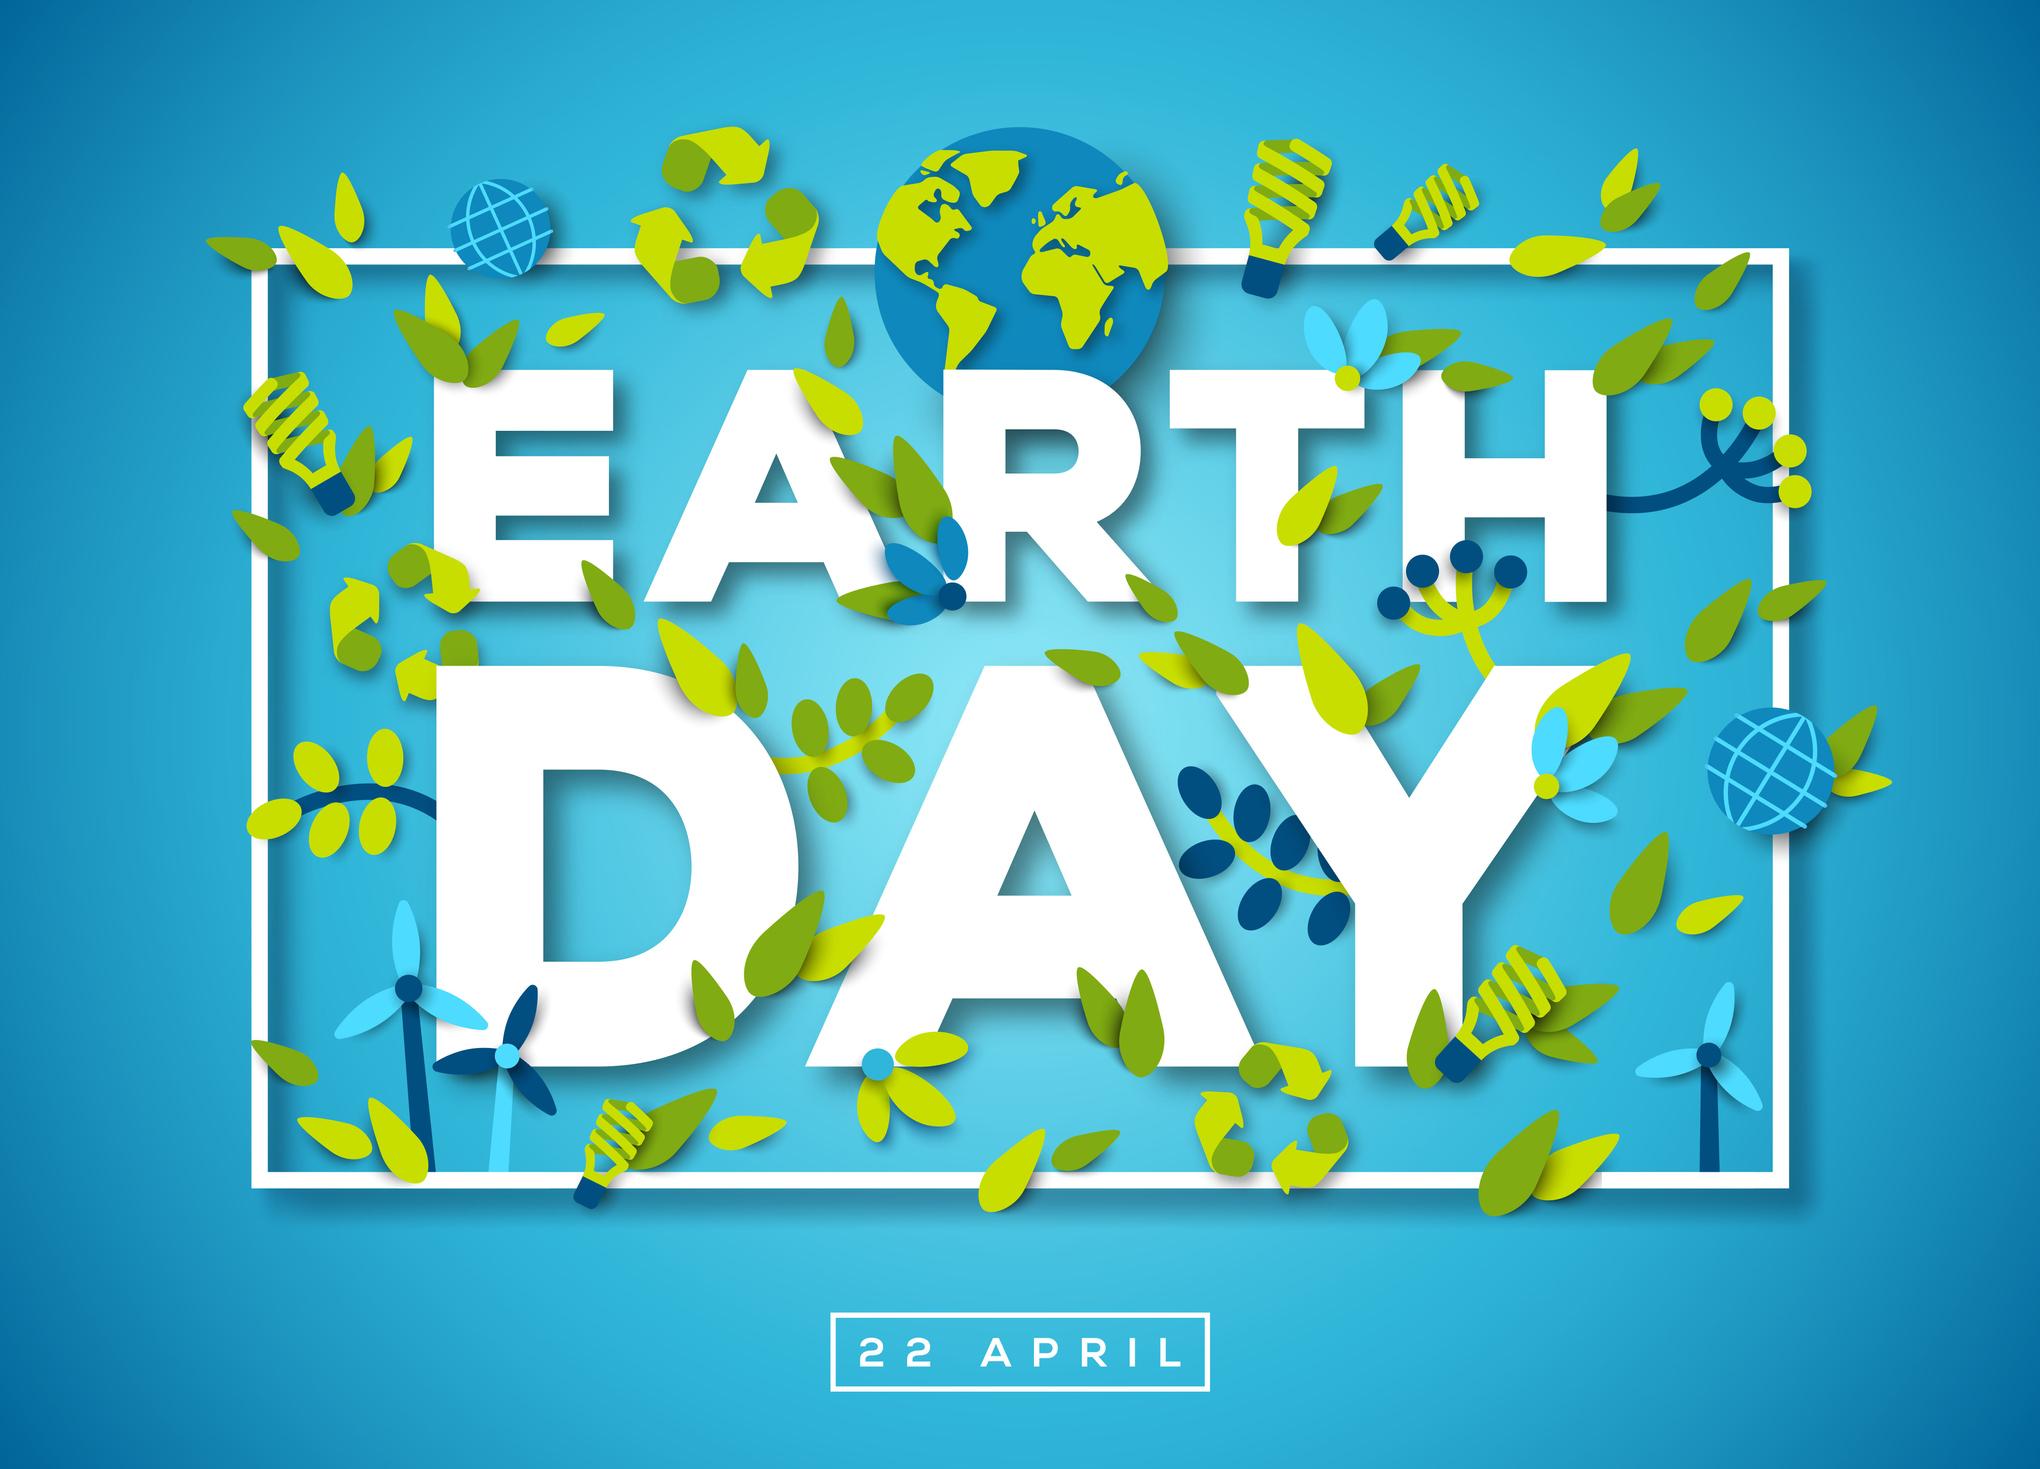 3 ETFs for a Better Earth Dave Kovaleski | Apr 22, 2021